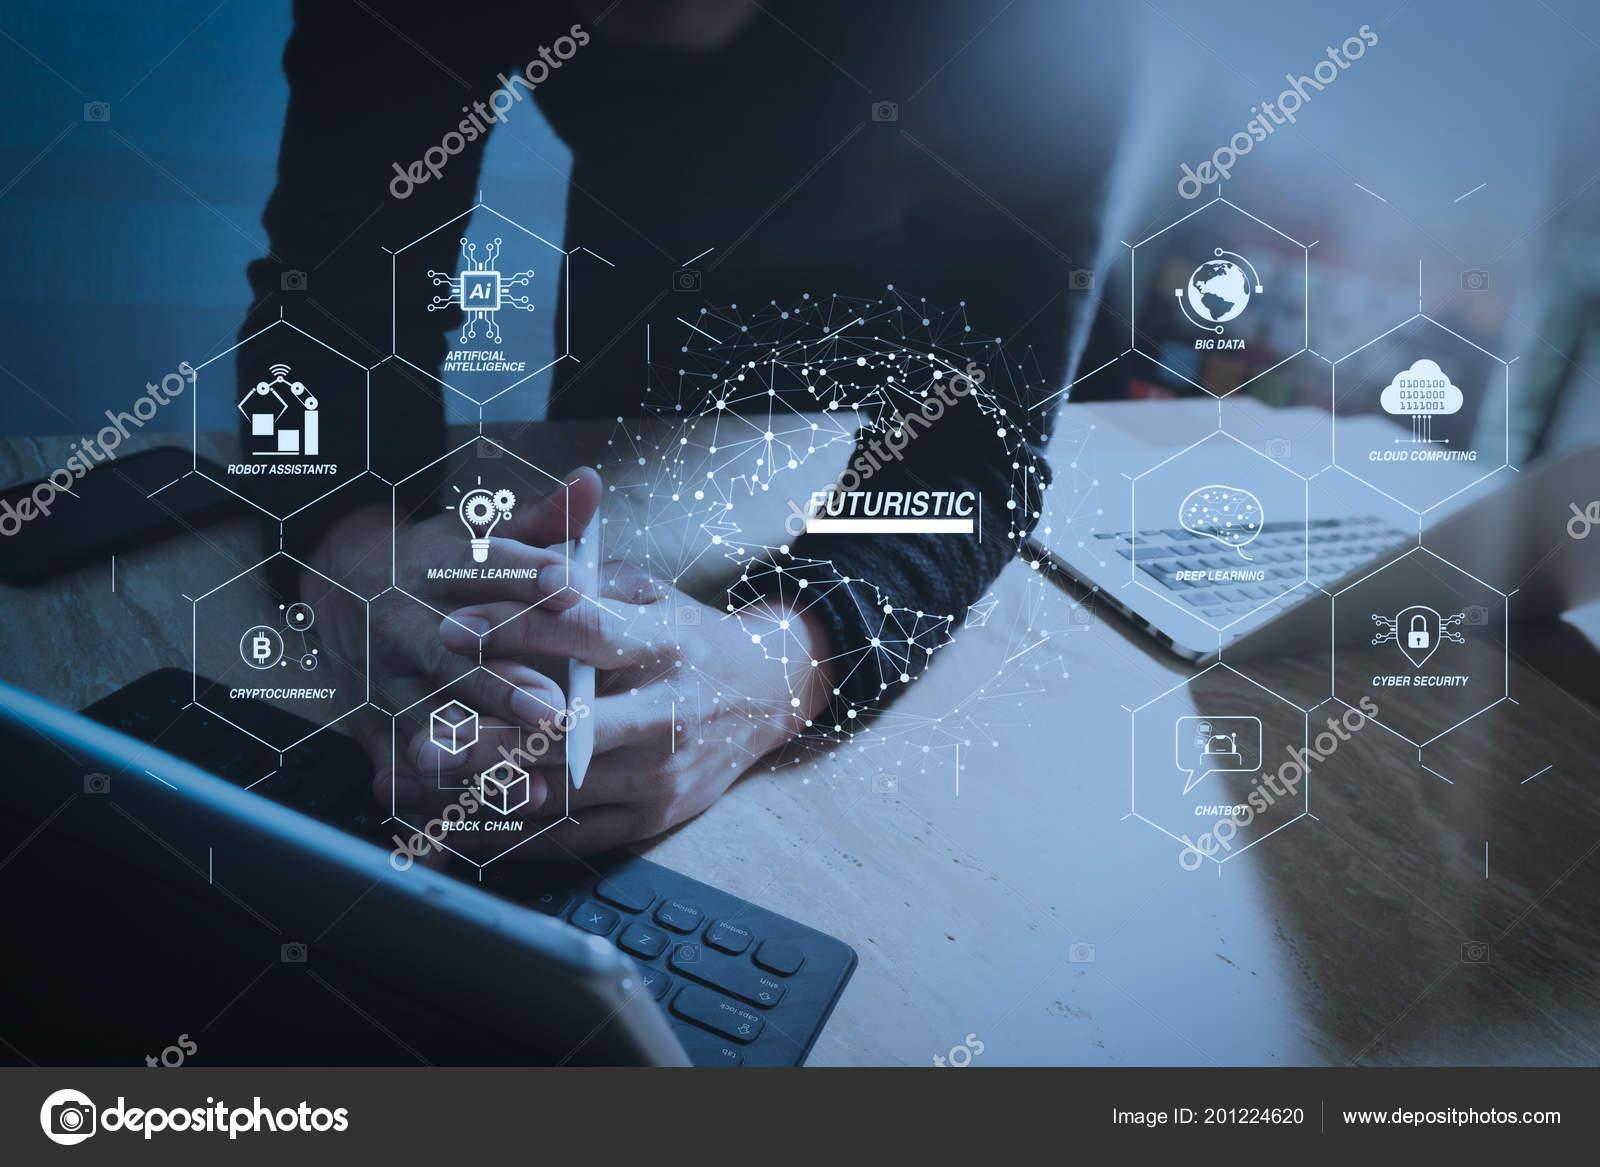 Futuristic industry business virtual diagram robot assistant cloud futuristic industry business virtual diagram robot assistant cloud big data fotografia de stock ccuart Gallery